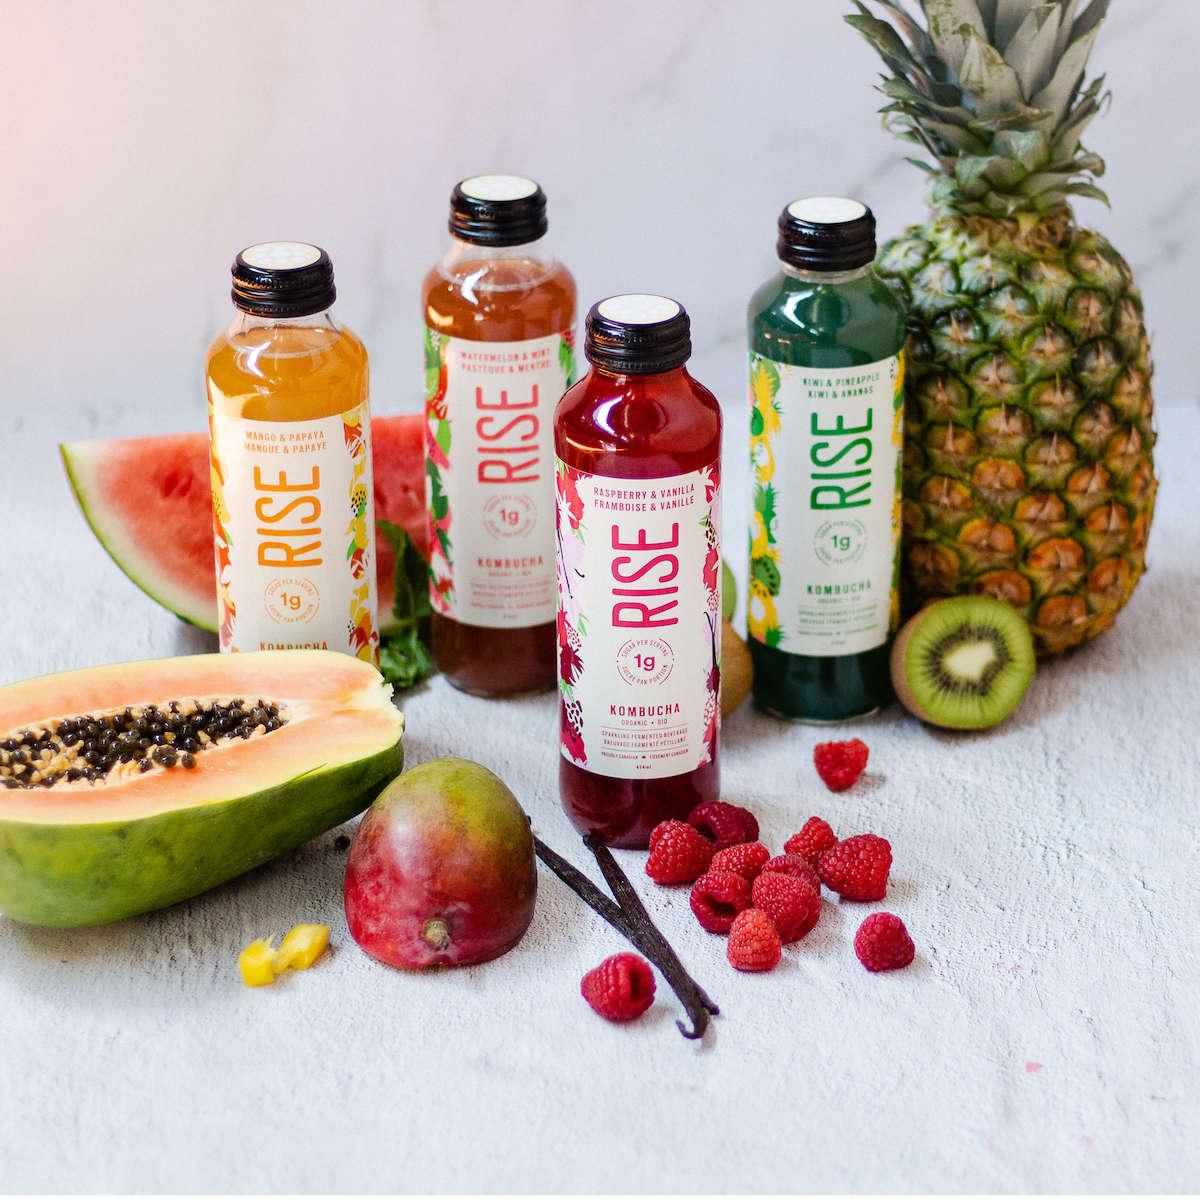 Rise Kombucha Products